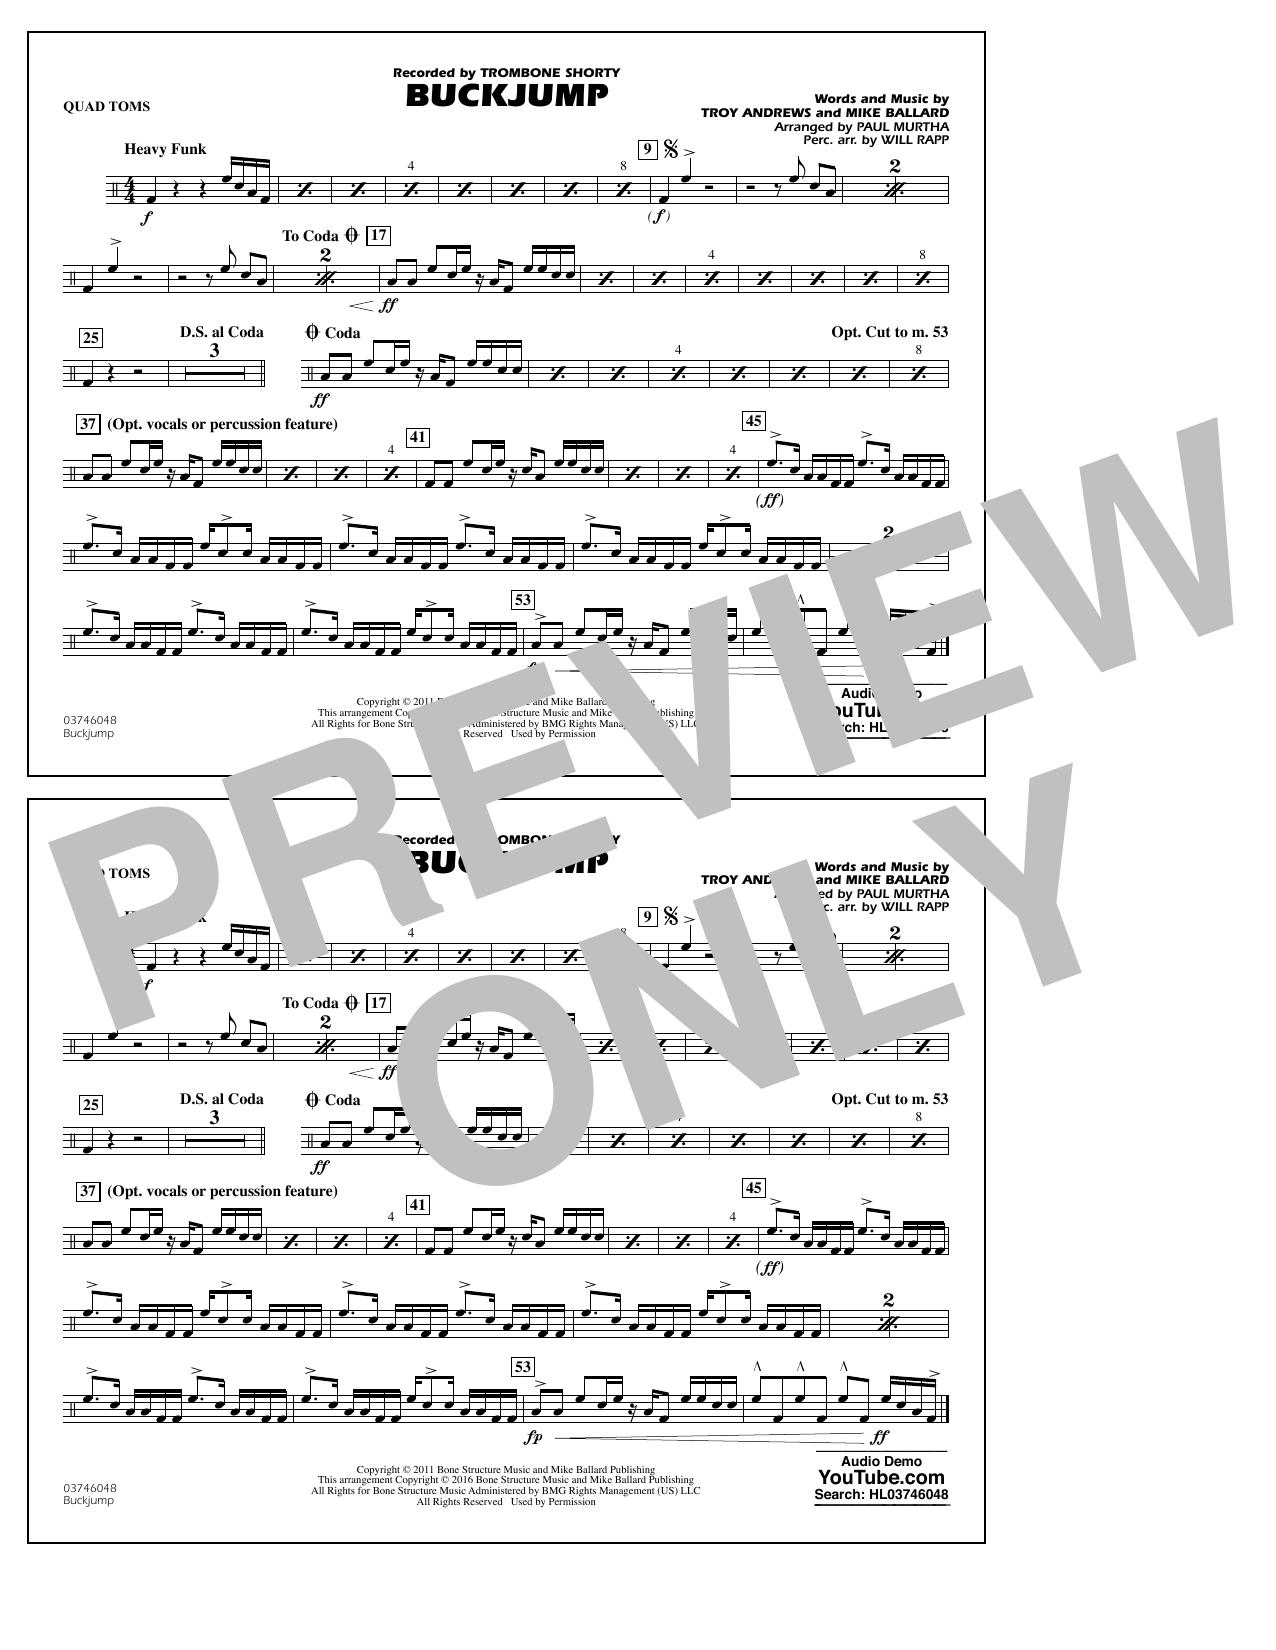 Buckjump - Quad Toms (Marching Band)